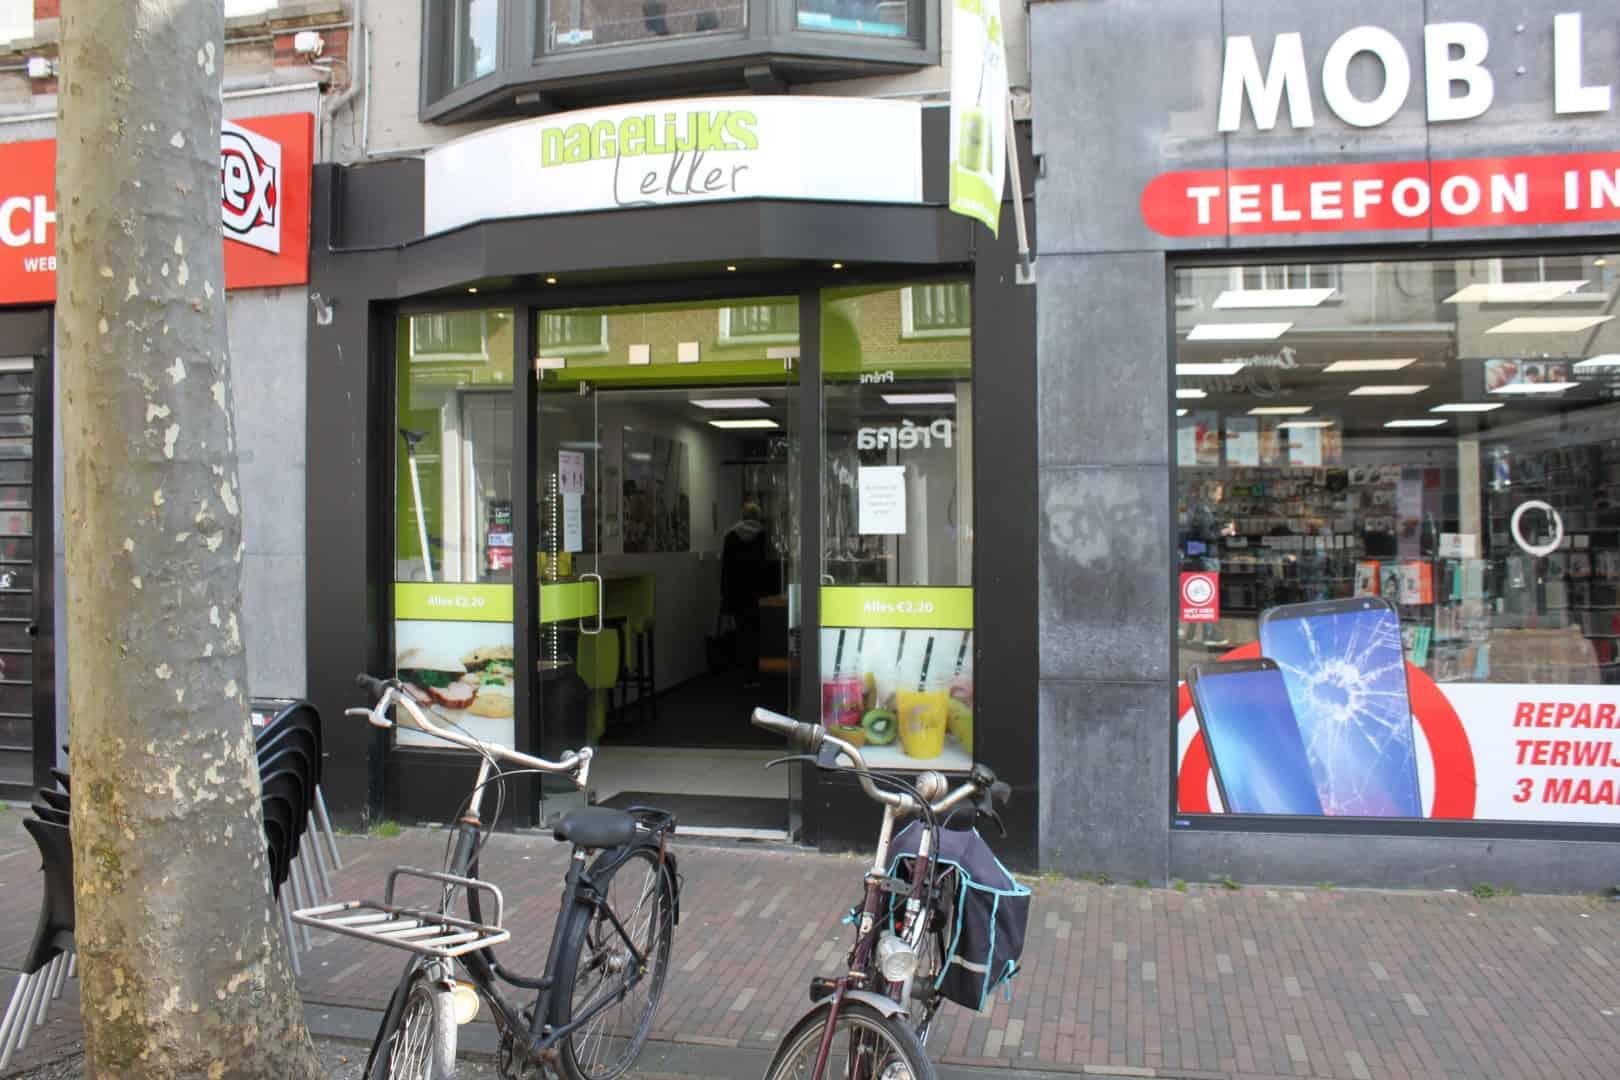 Casco-horecaruimte met woning in Haarlem